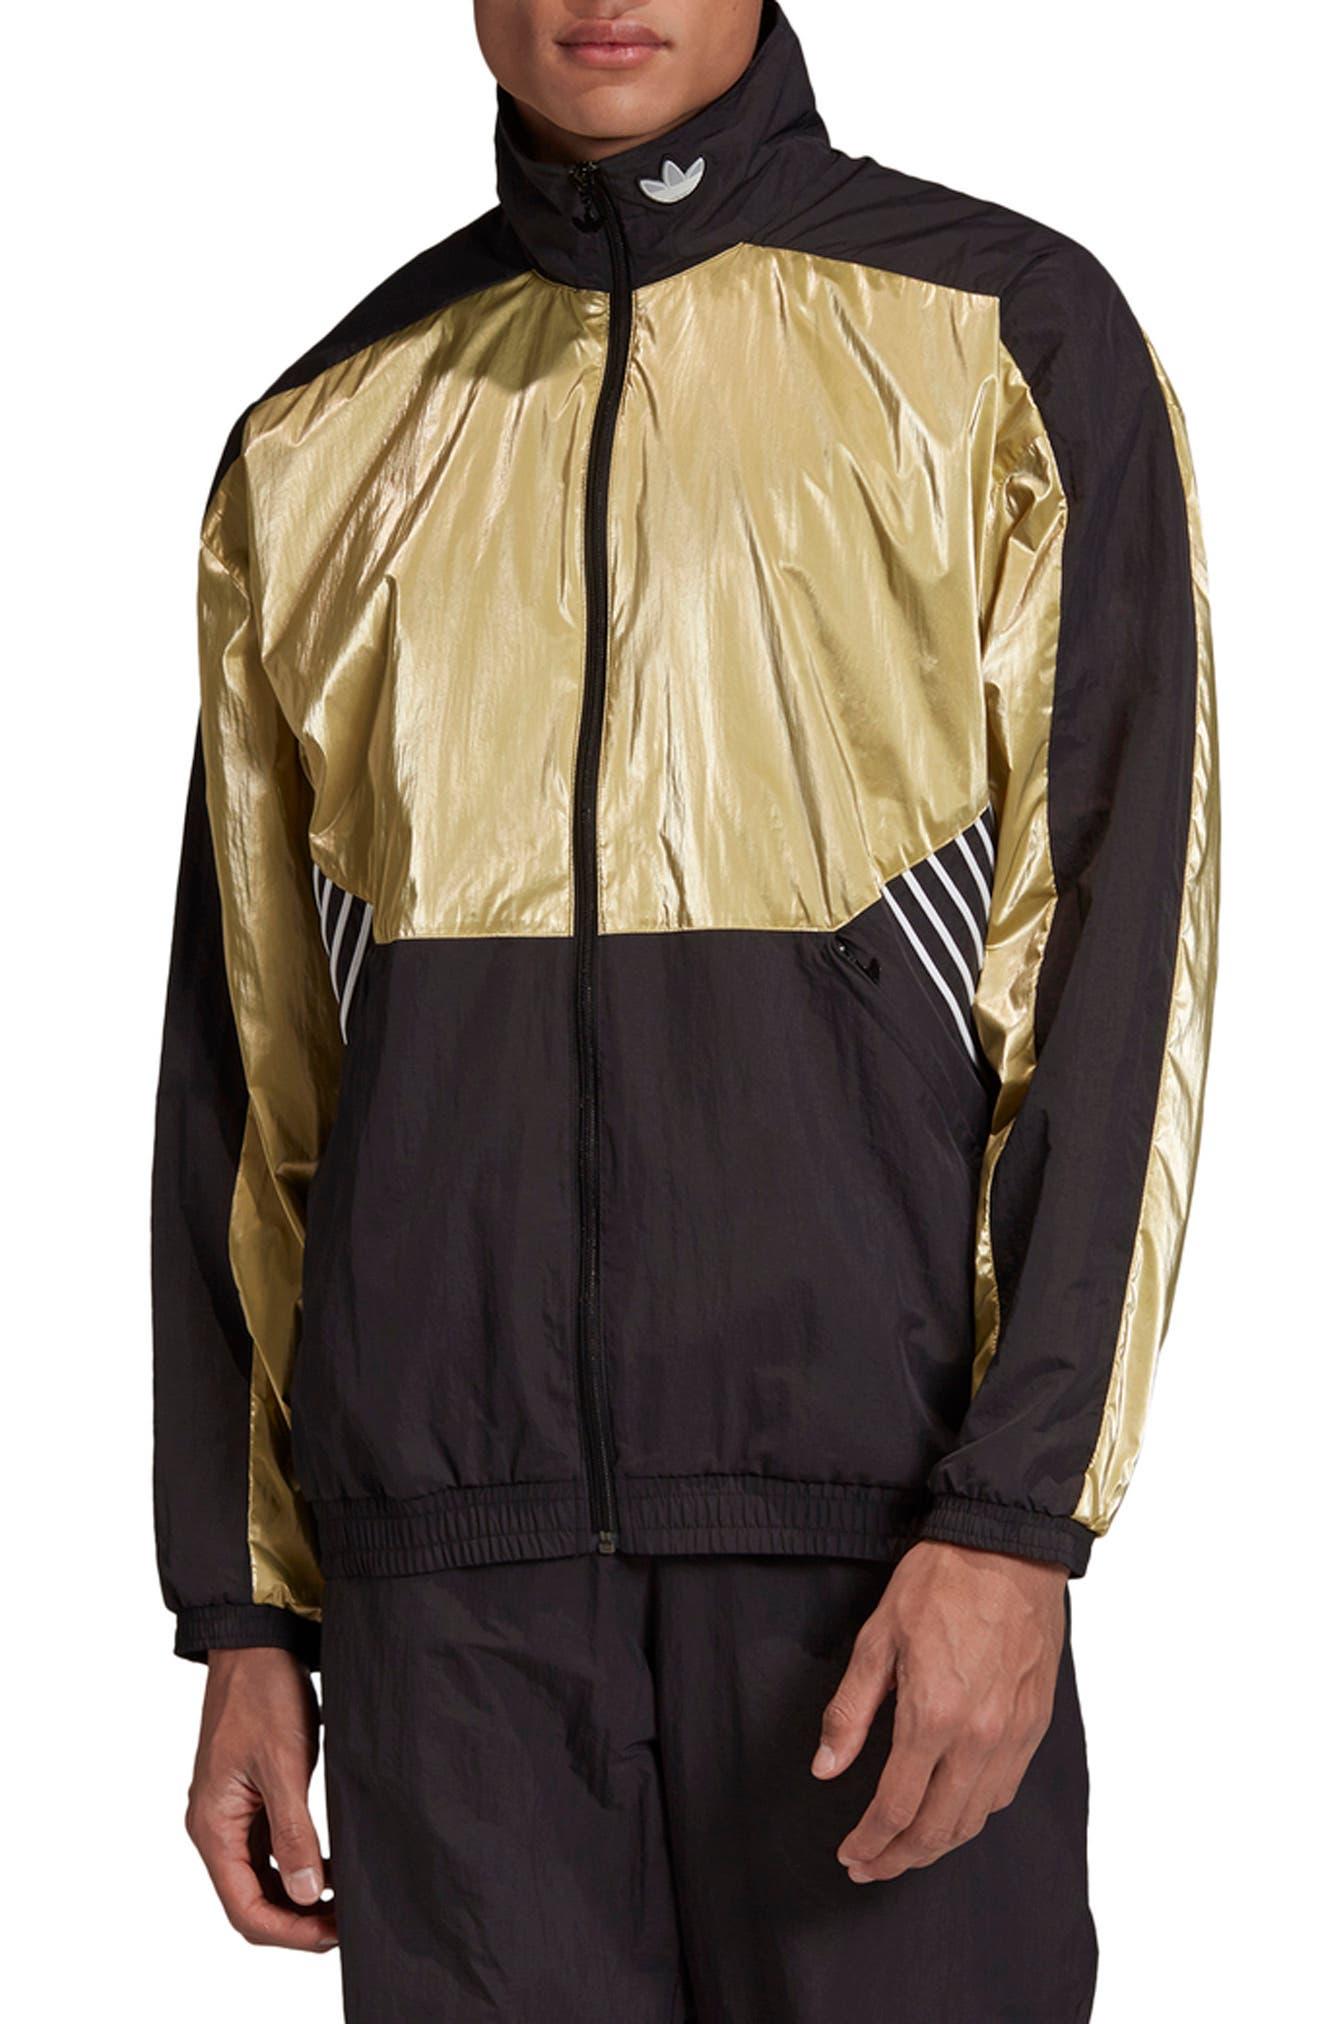 Adidas Originals Tolima-02 Track Jacket In Black/ Metallic Gold